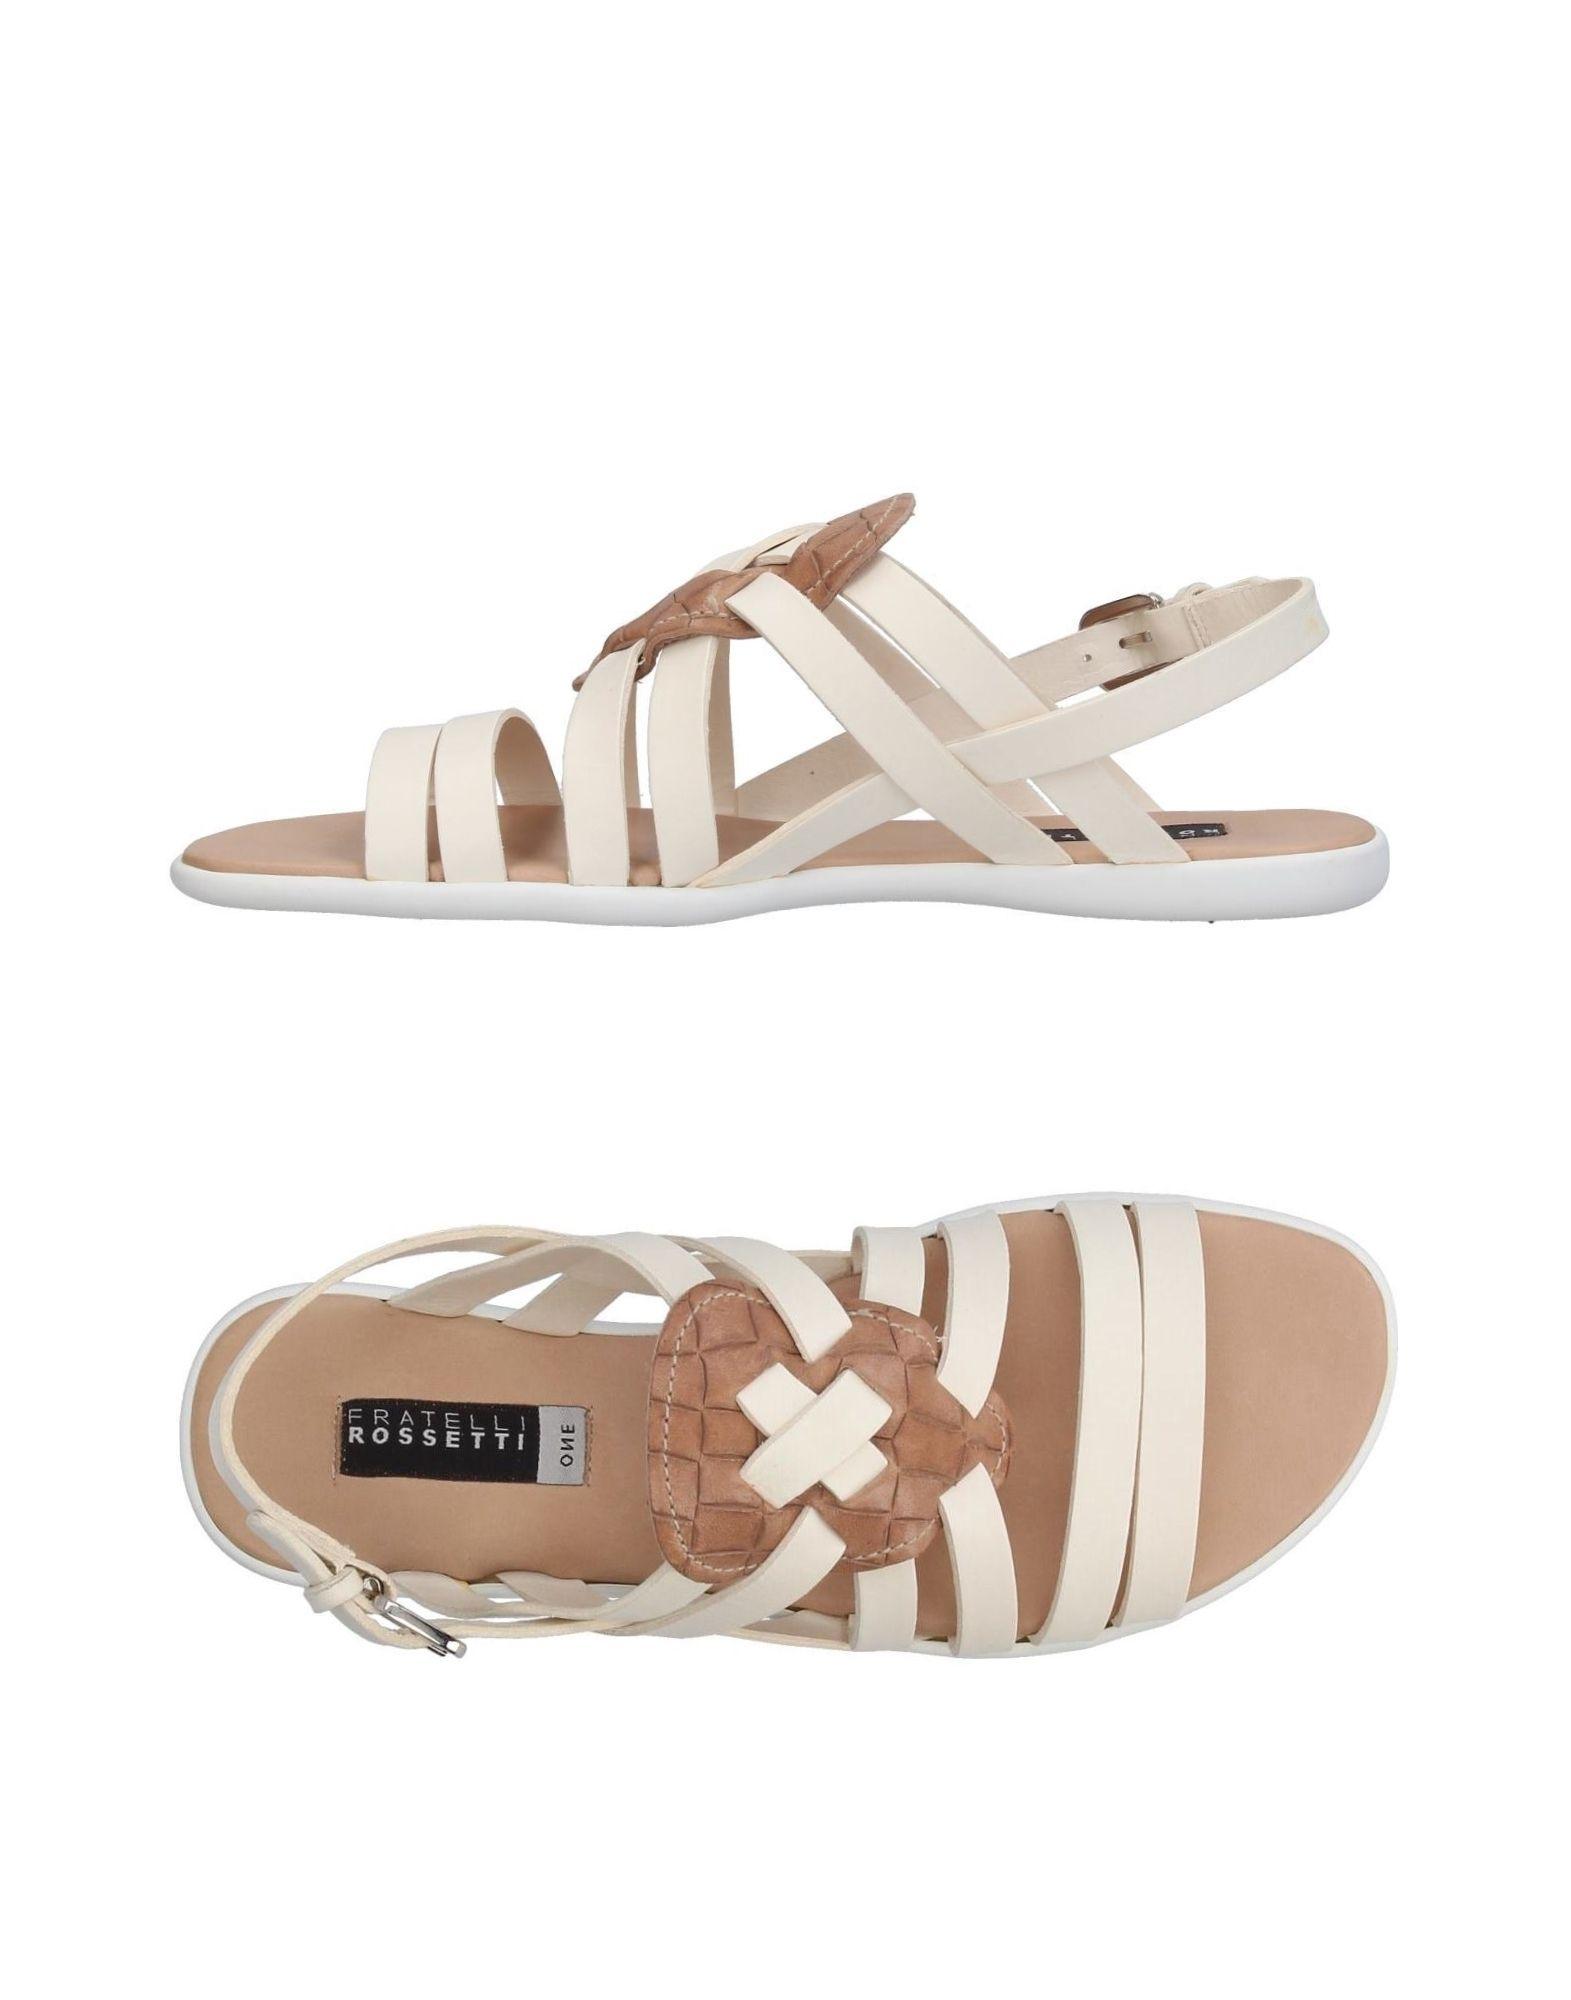 Fratelli Rossetti Sandalen Damen  11392046GFGut aussehende strapazierfähige Schuhe